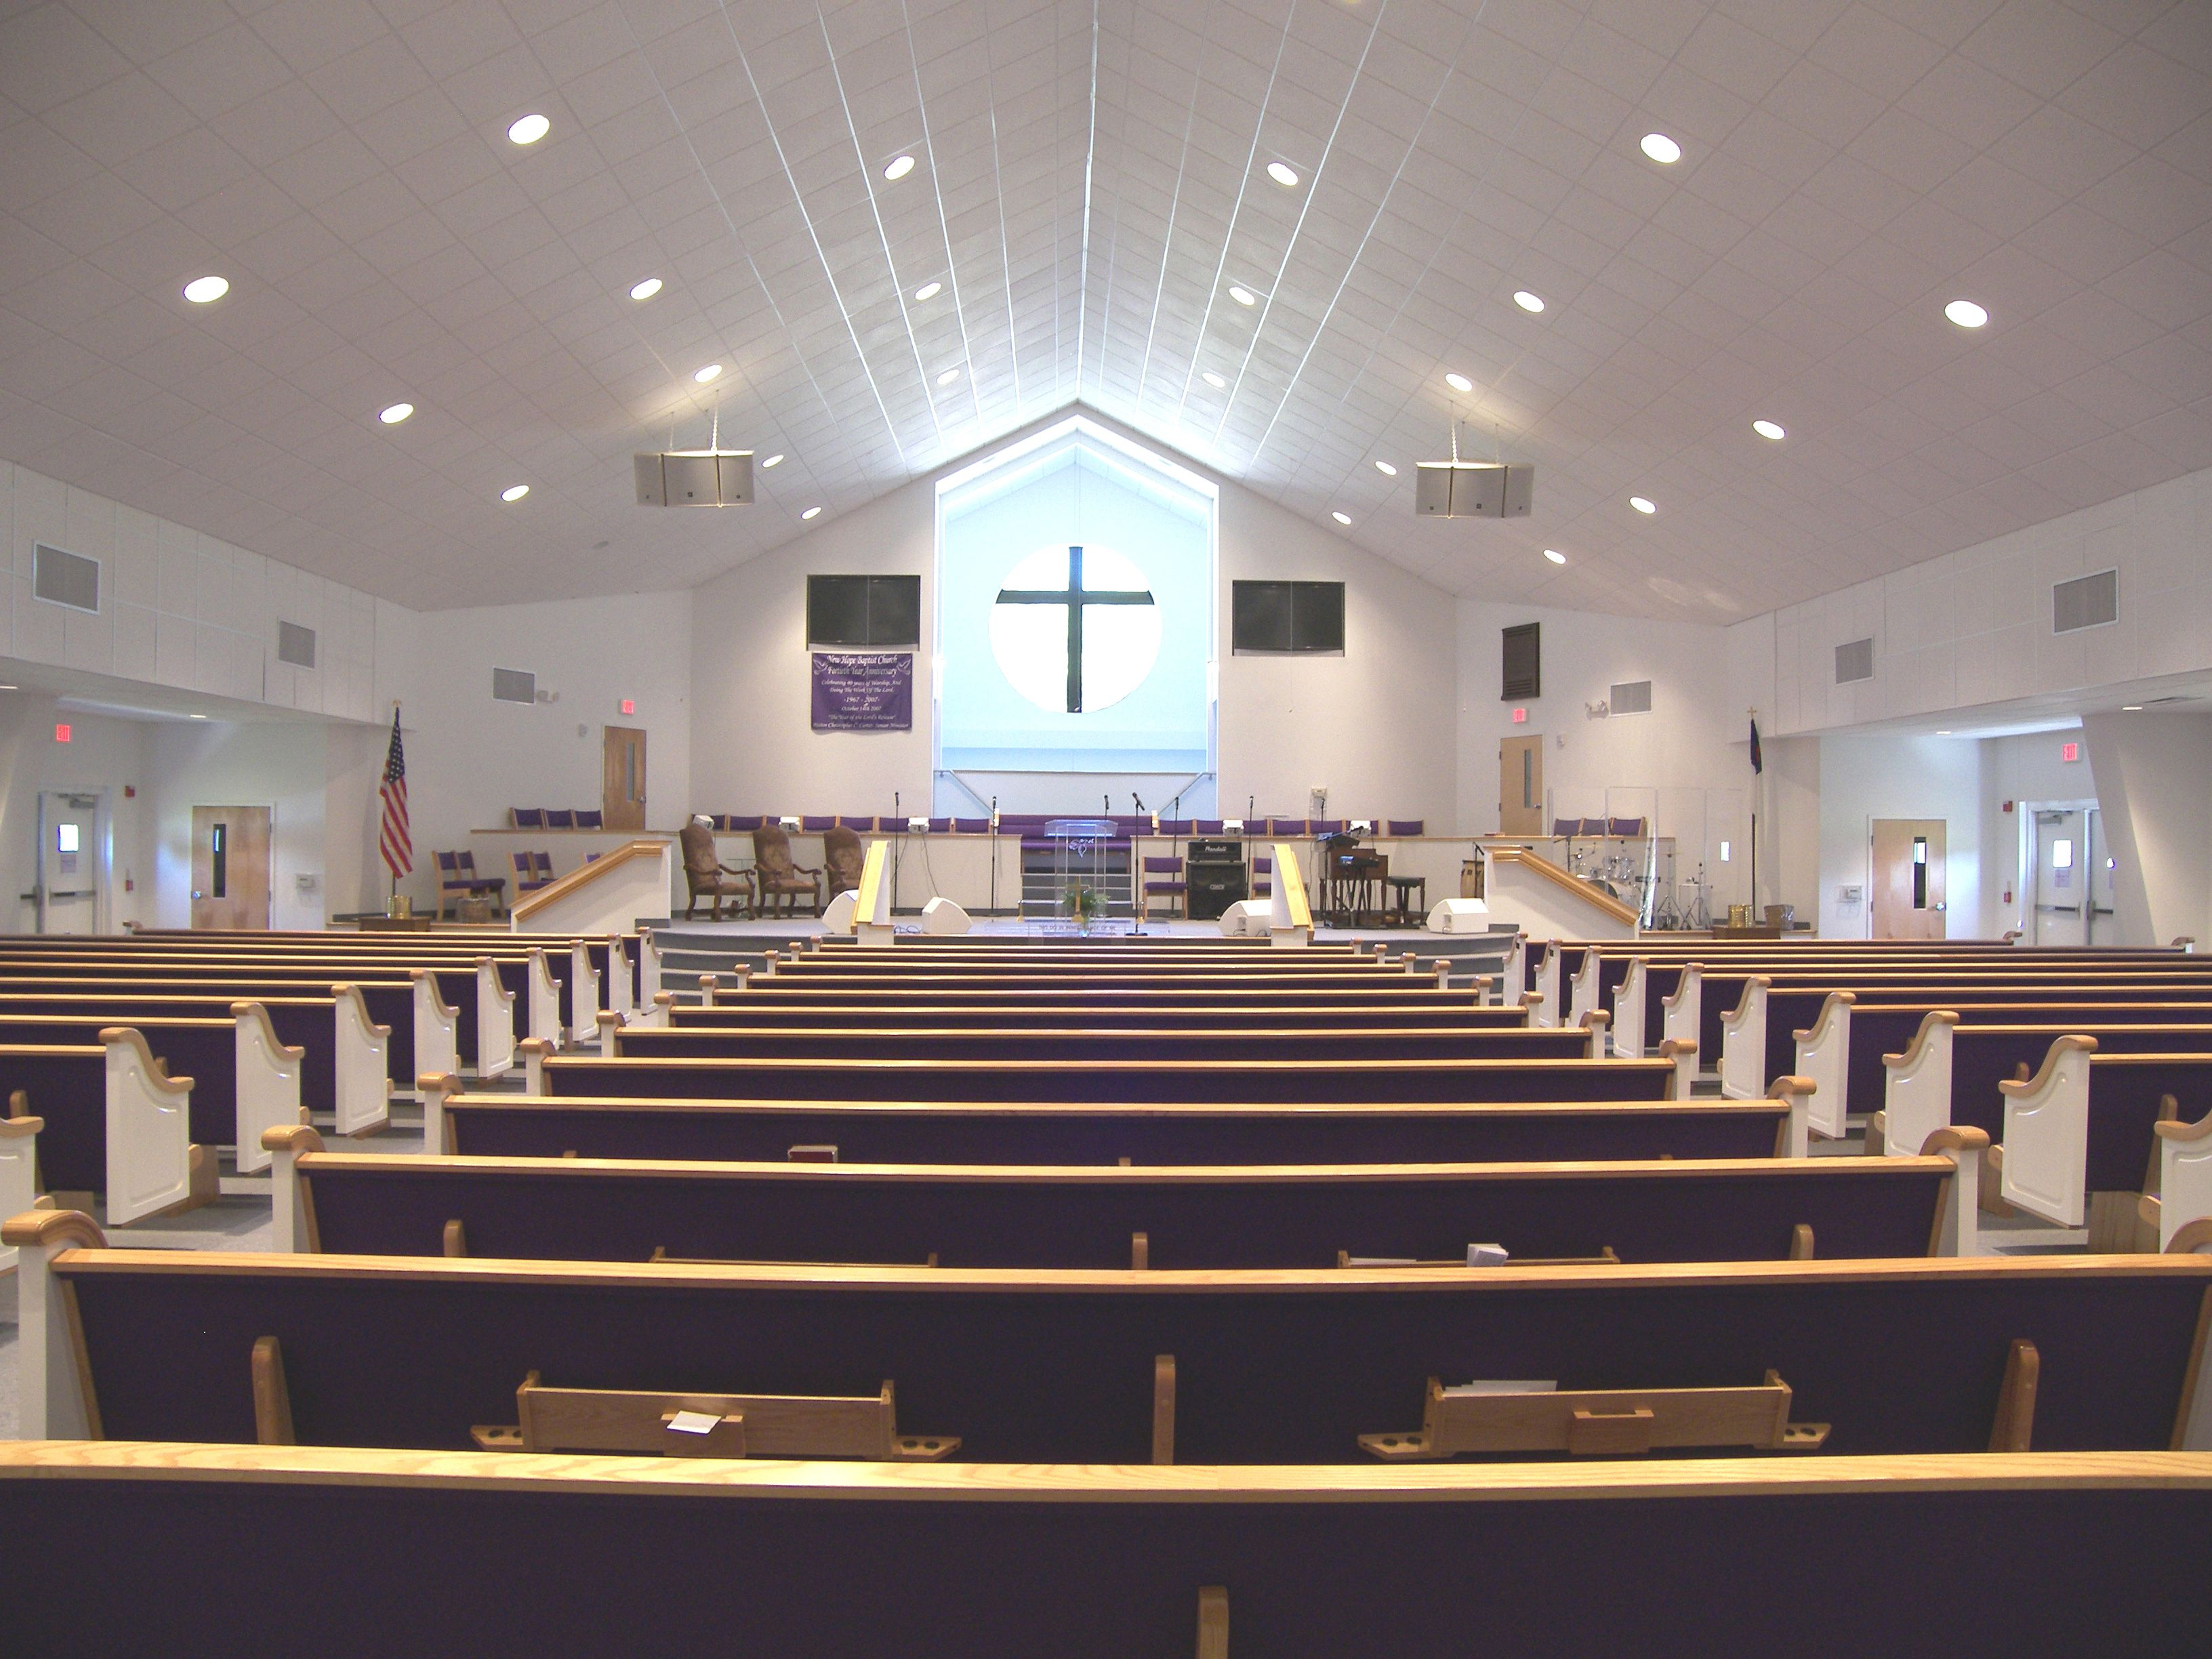 New Hope Baptist Church interior